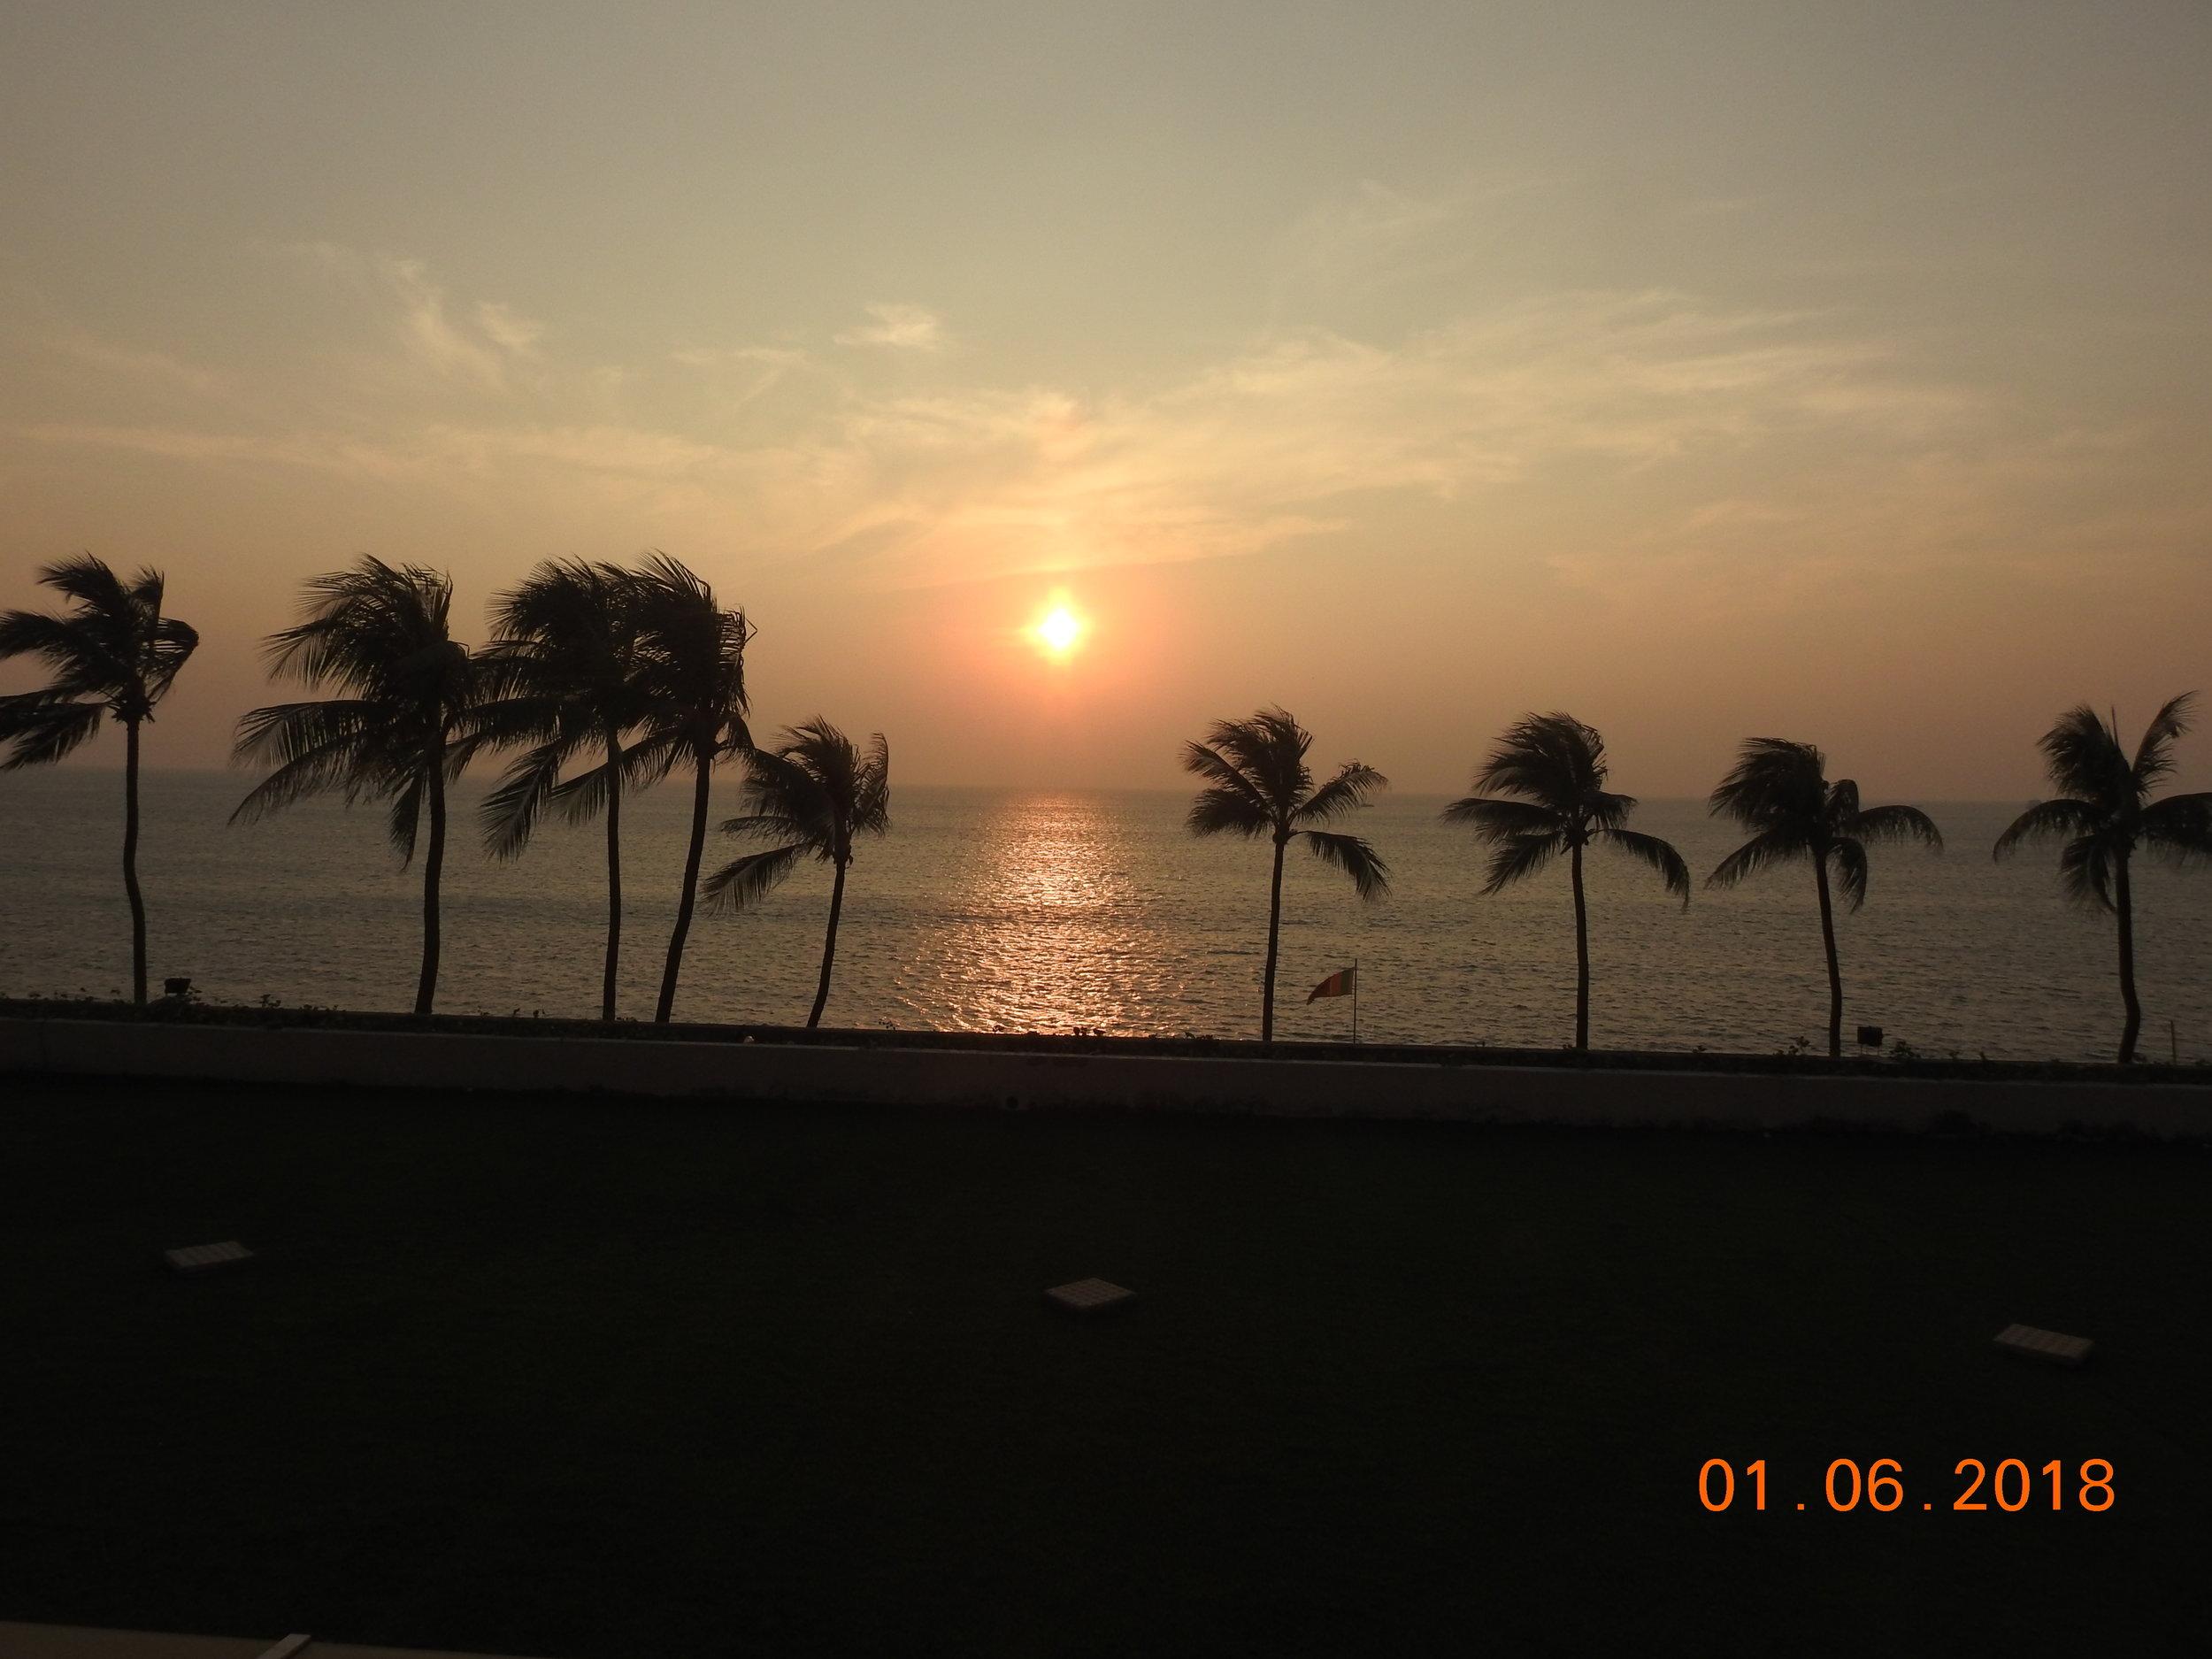 invite-to-paradise-sri-lanka-maldives-holiday-specialists-nutan-vidyut-patel-sunset-1.JPG